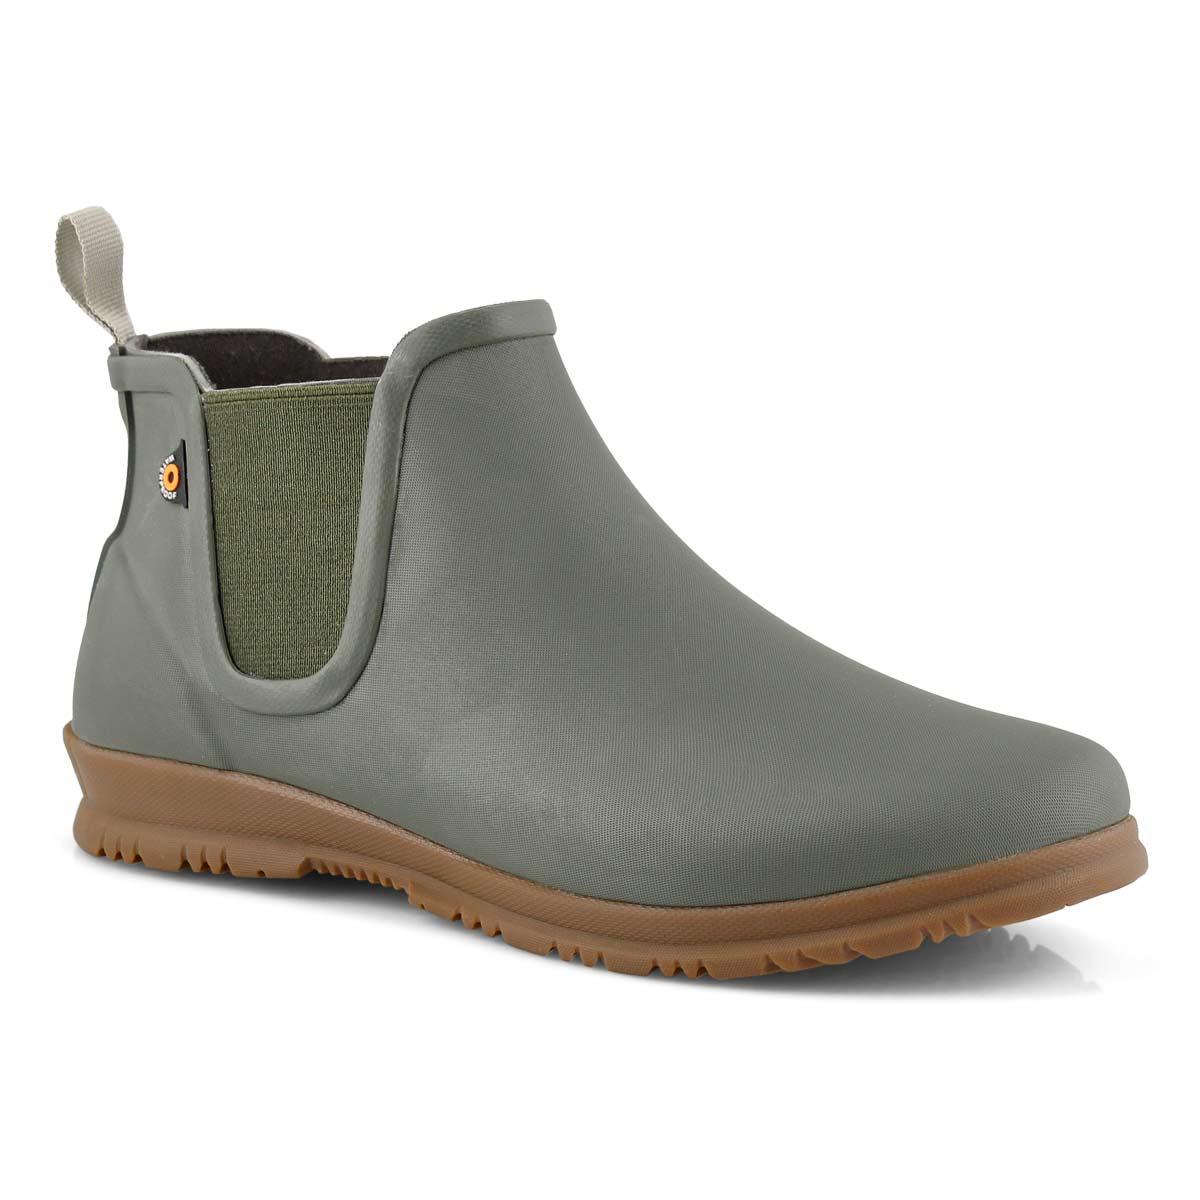 Lds Sweetpea sage waterproof boot